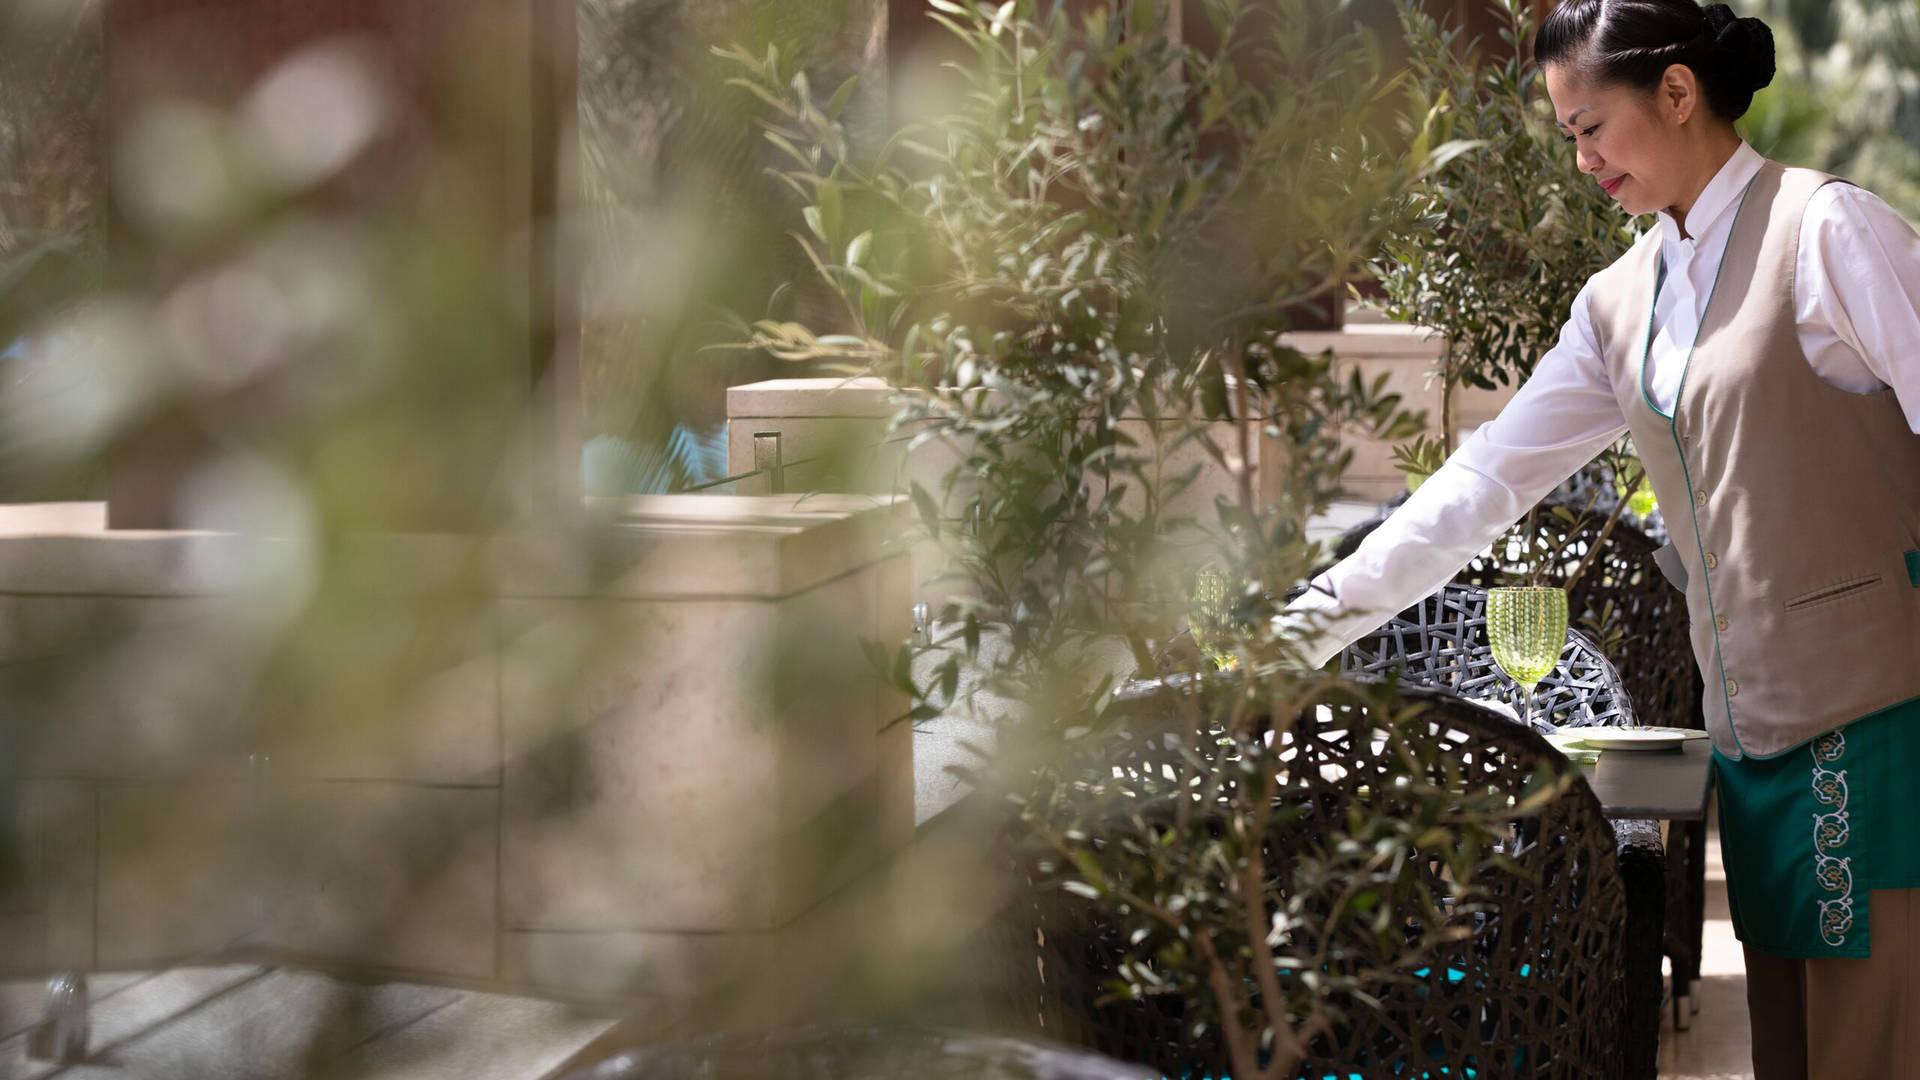 Jumeirah Messilah Beach Hotel gardens